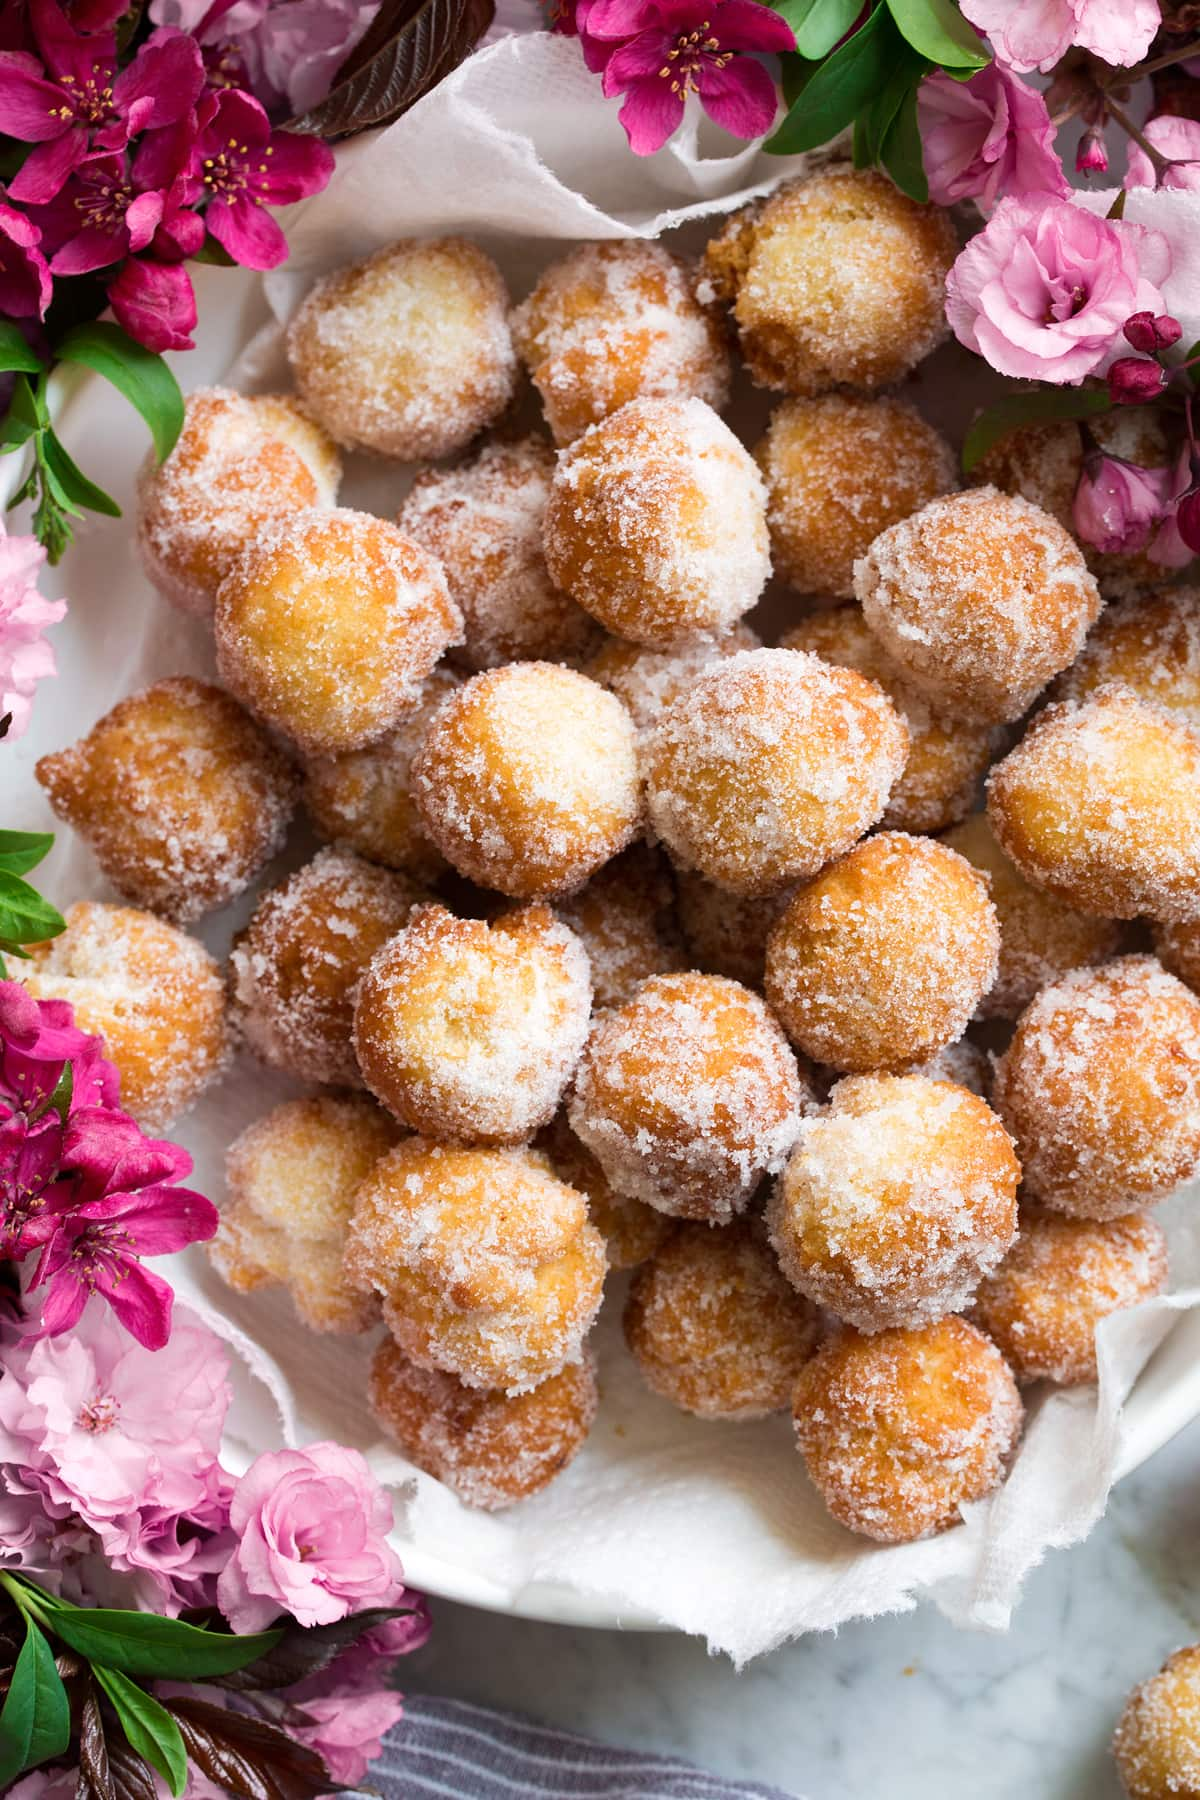 Bowl full of fresh donut holes covered in cinnamon sugar.